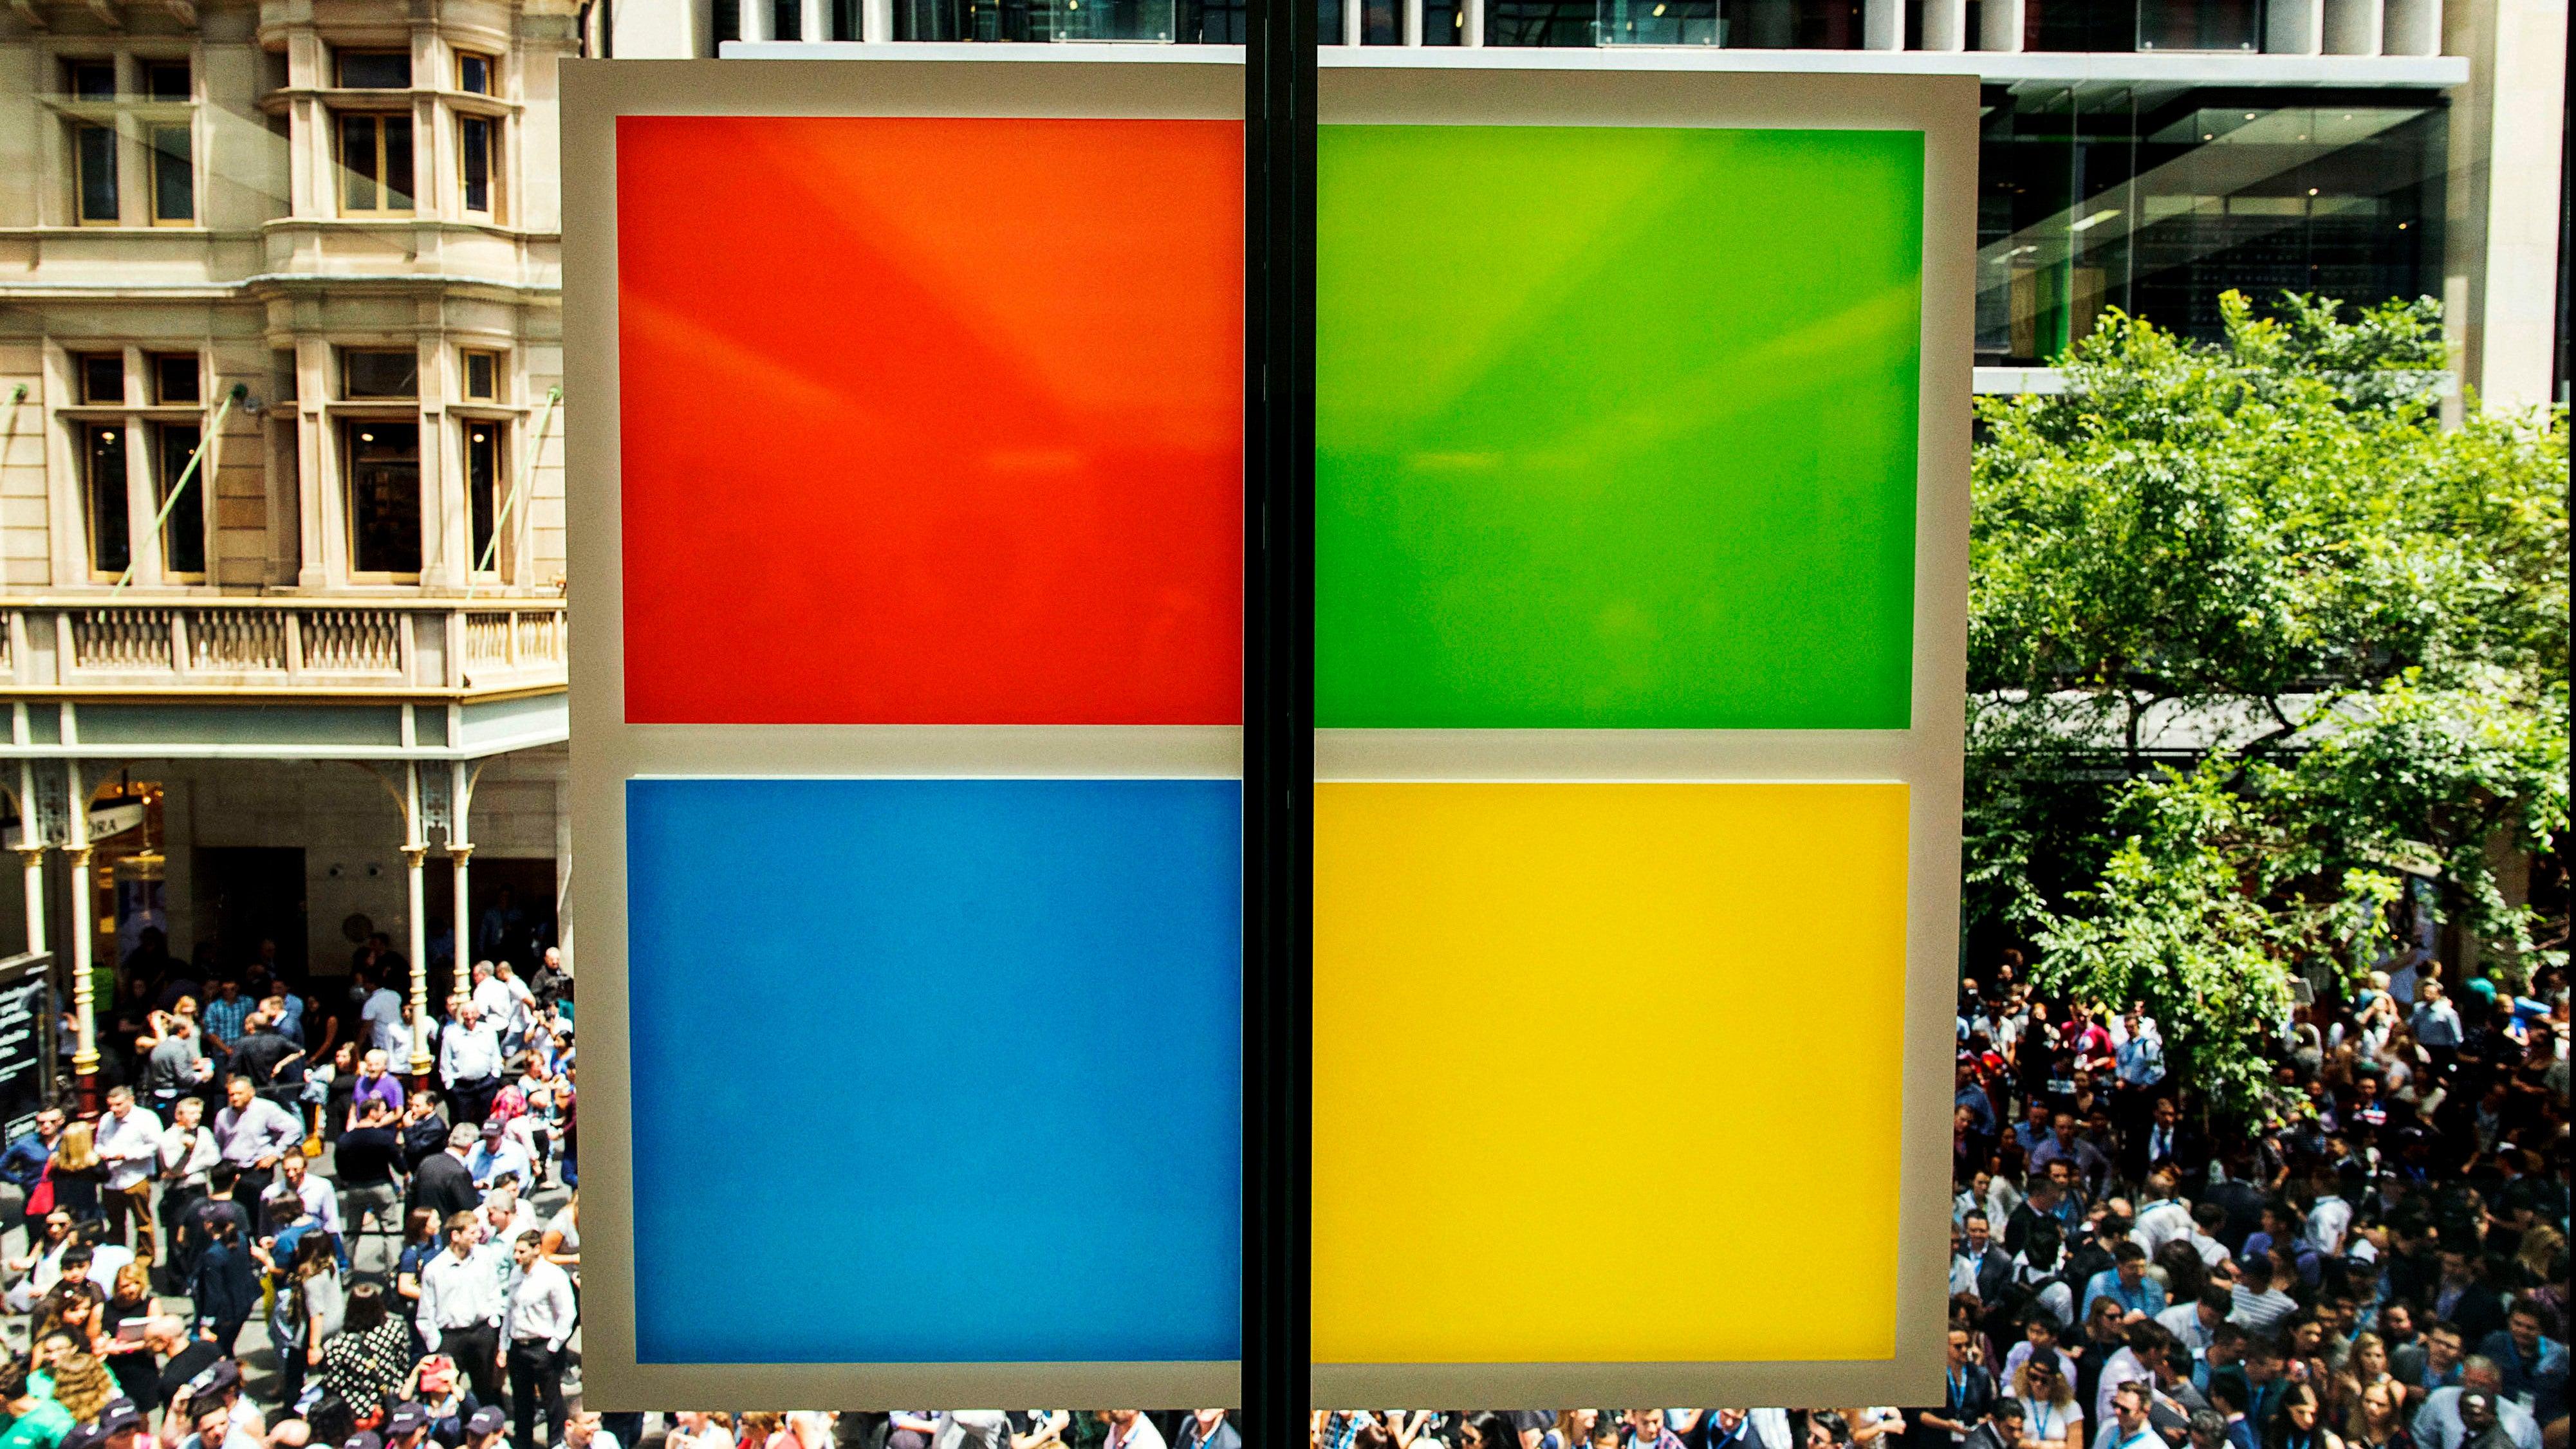 Microsoft's Windows 10 April 2018 Update: What's New